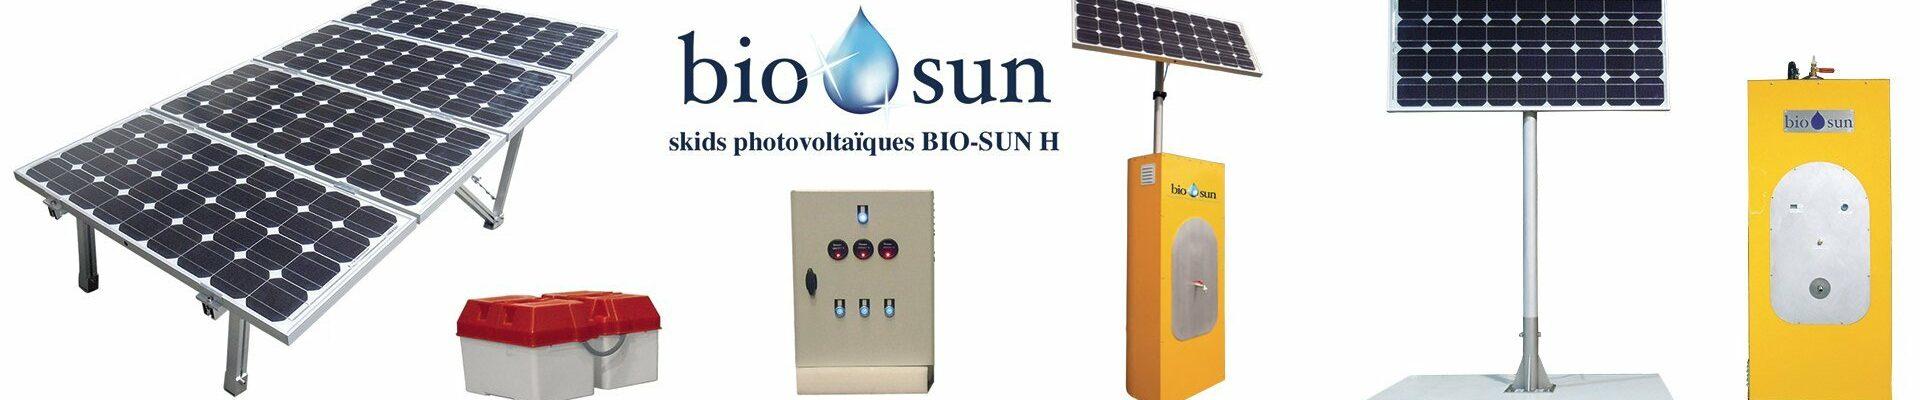 STATION-UV-SOLAIRE-BIO-SUN